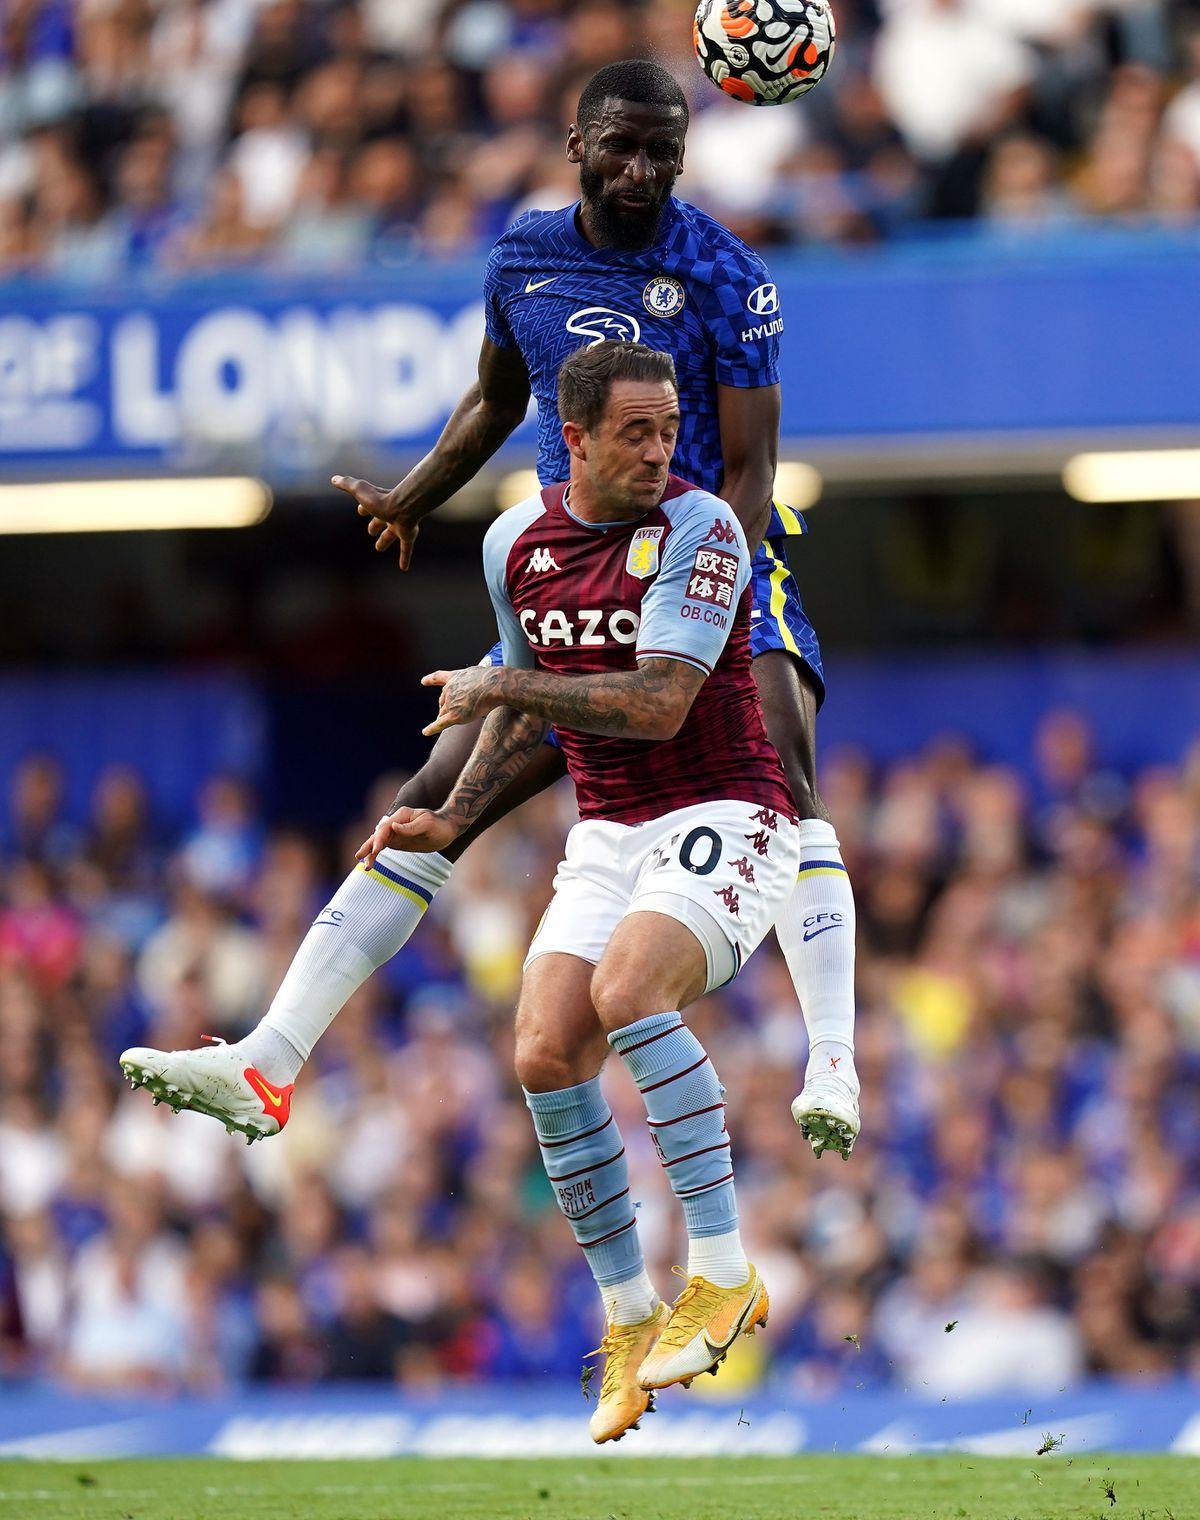 Chelsea's Antonio Rudiger out jumps Aston Villa's Danny Ings